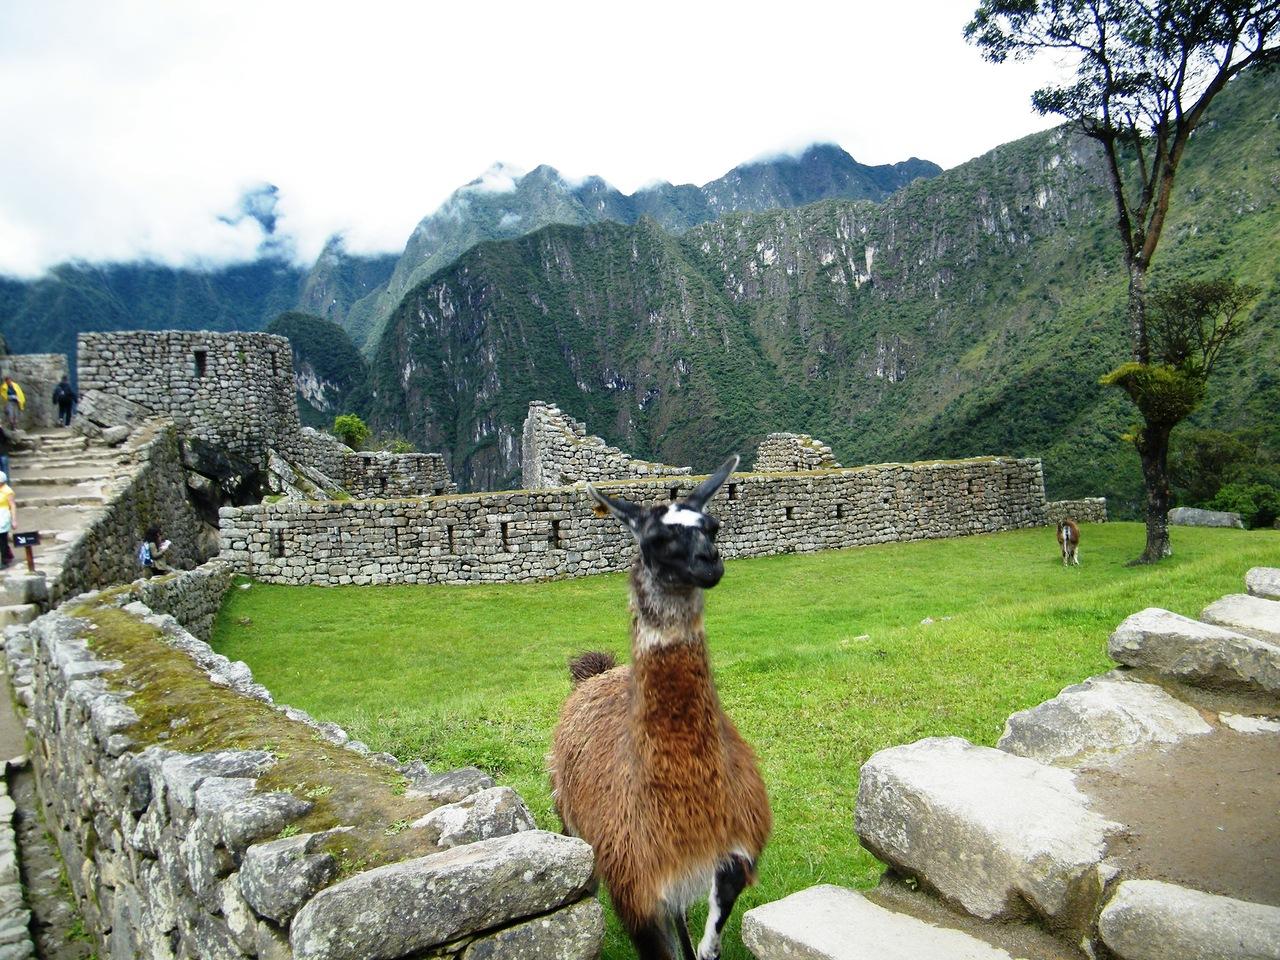 Peru OA1/DL1CW DX News